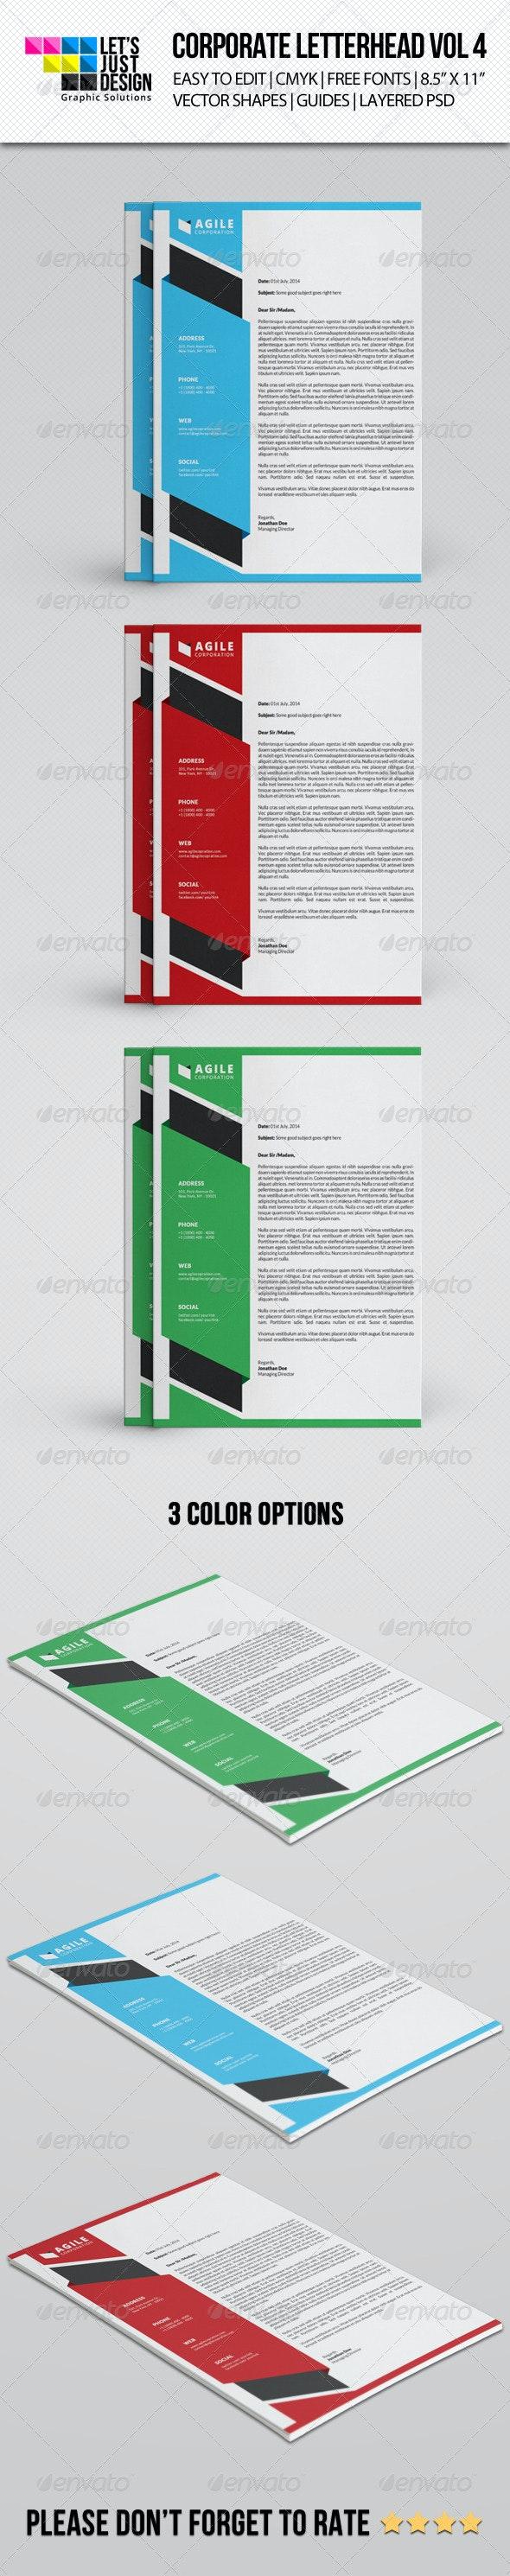 Corporate Letterhead Vol 4 - Stationery Print Templates